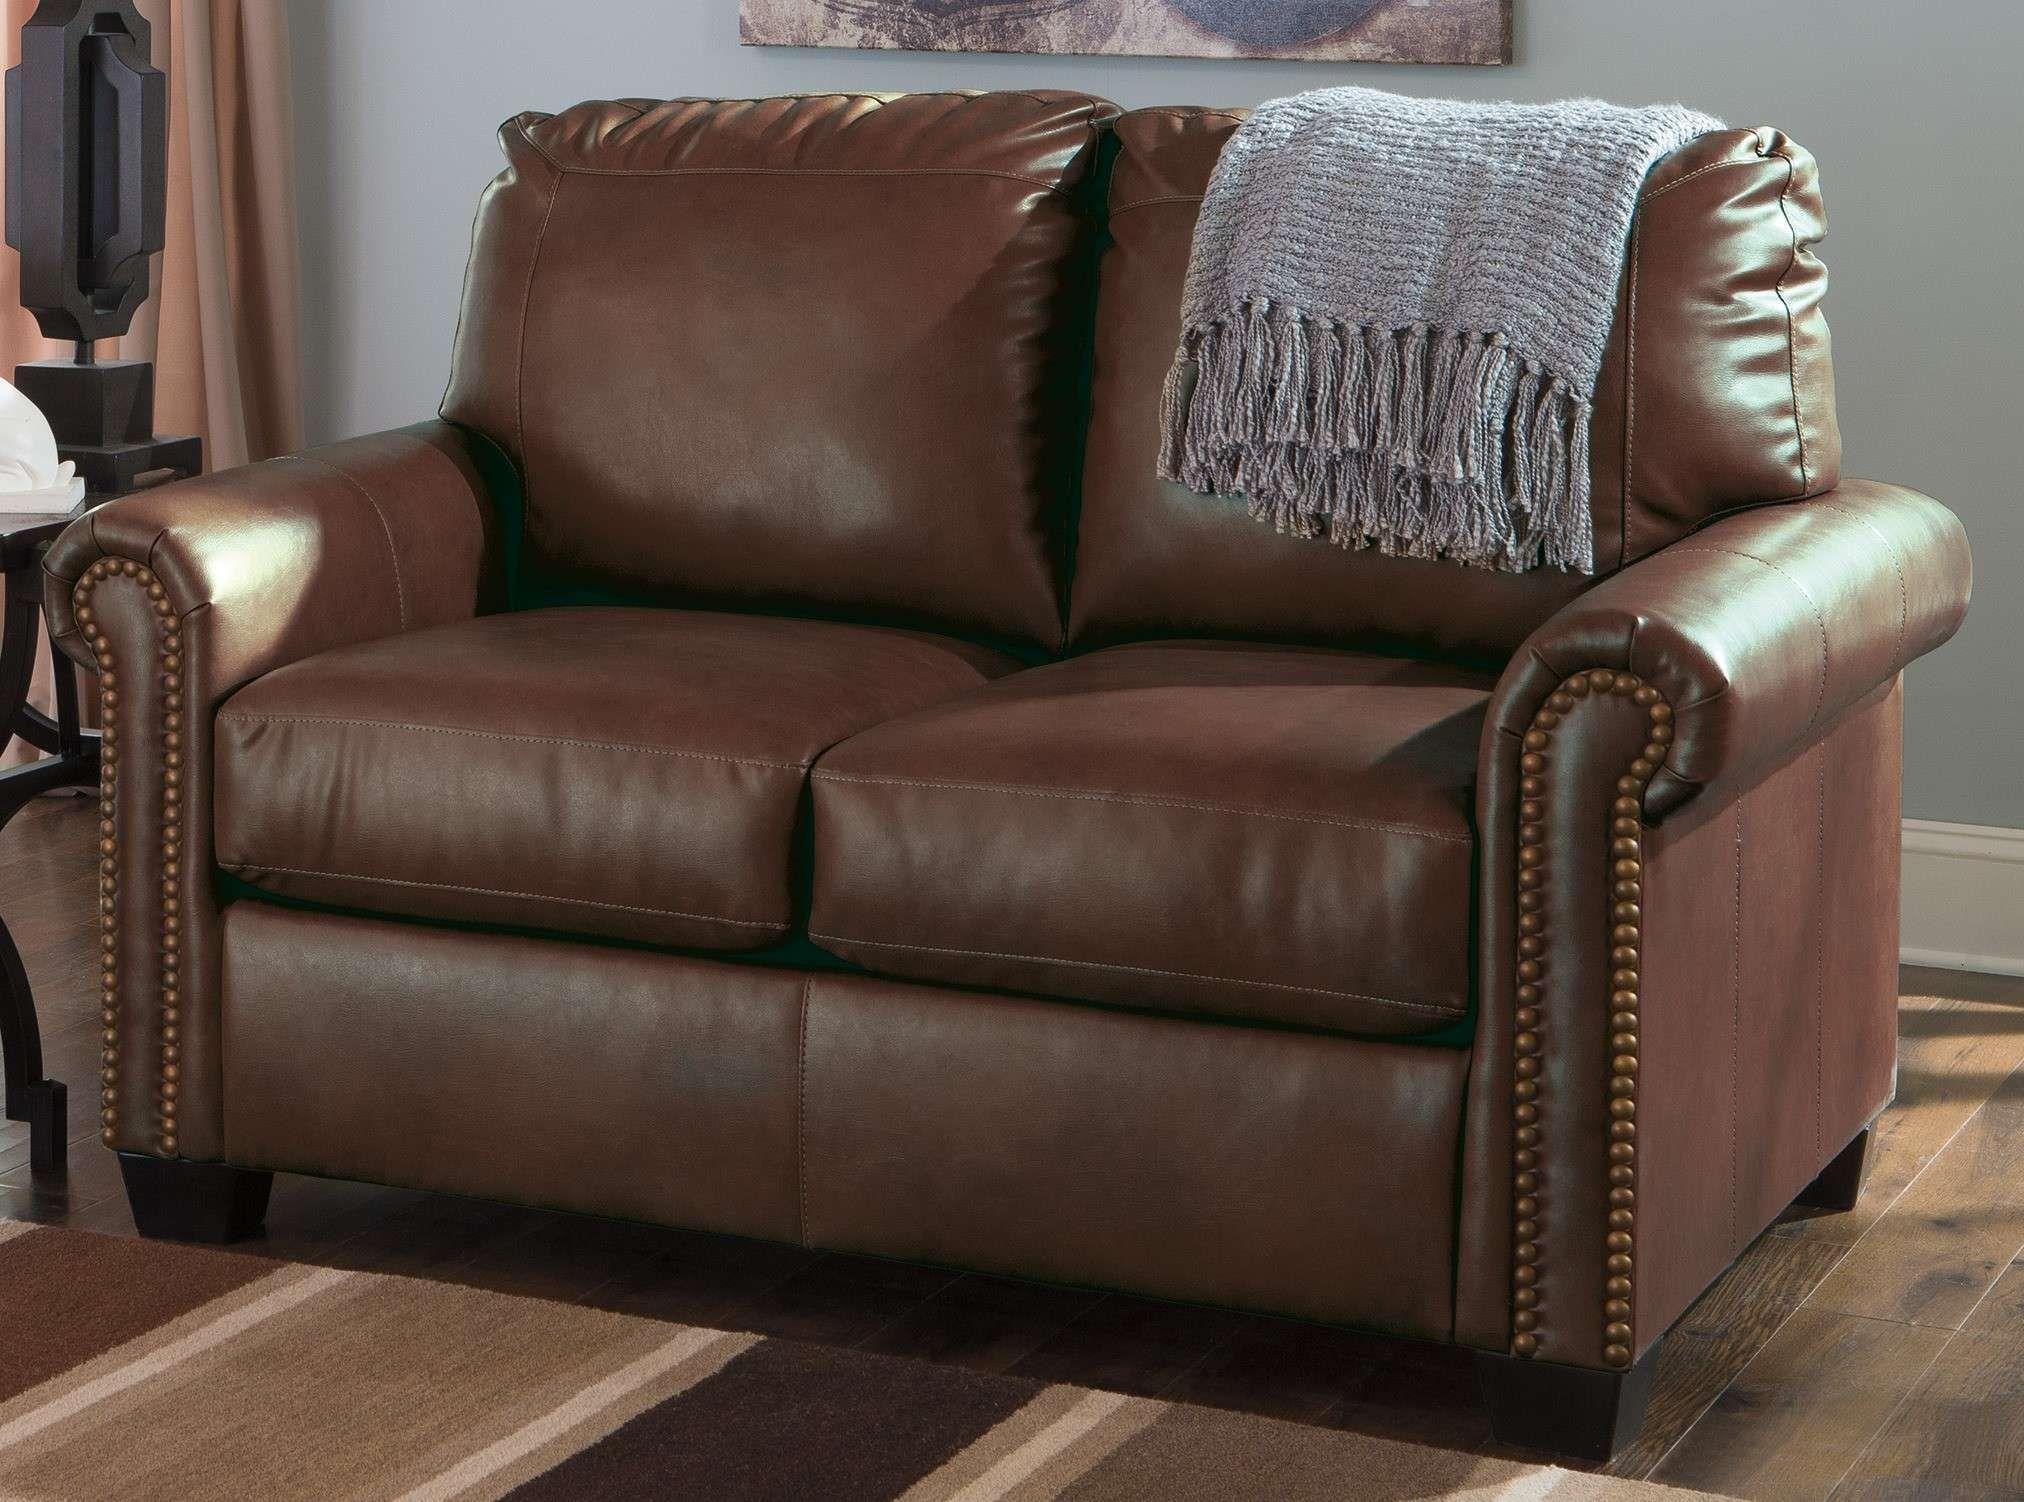 Surprising Lottie Durablend Chocolate Twin Sleeper Sofa Hot Sellers Dailytribune Chair Design For Home Dailytribuneorg